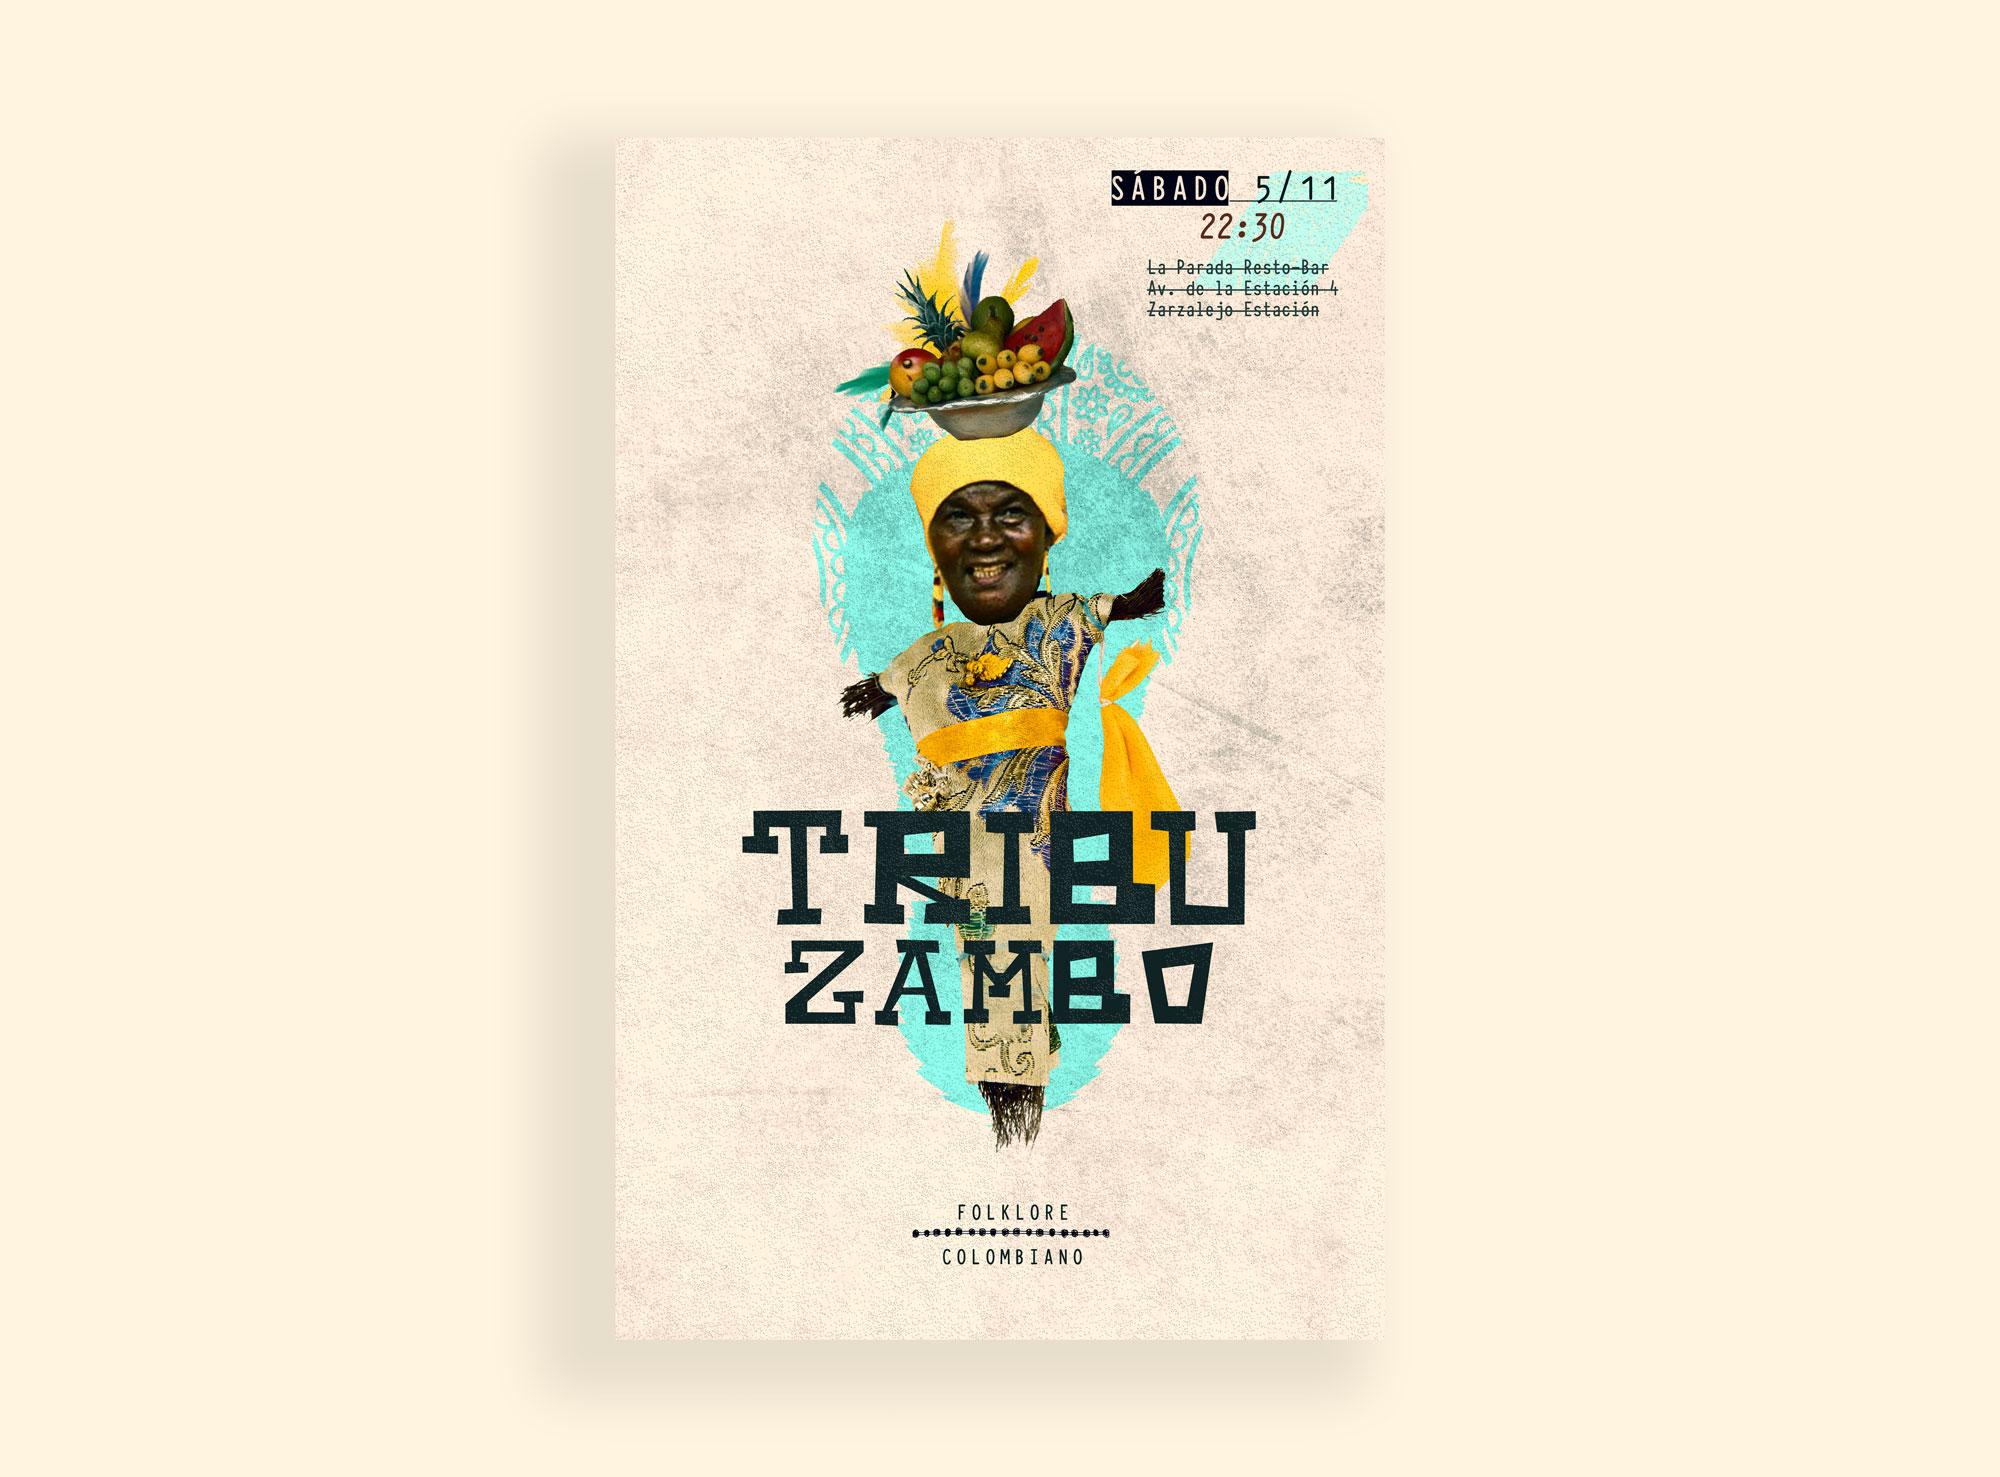 TRIBUZAMBO-MI-AMIGO-KRUGER-02